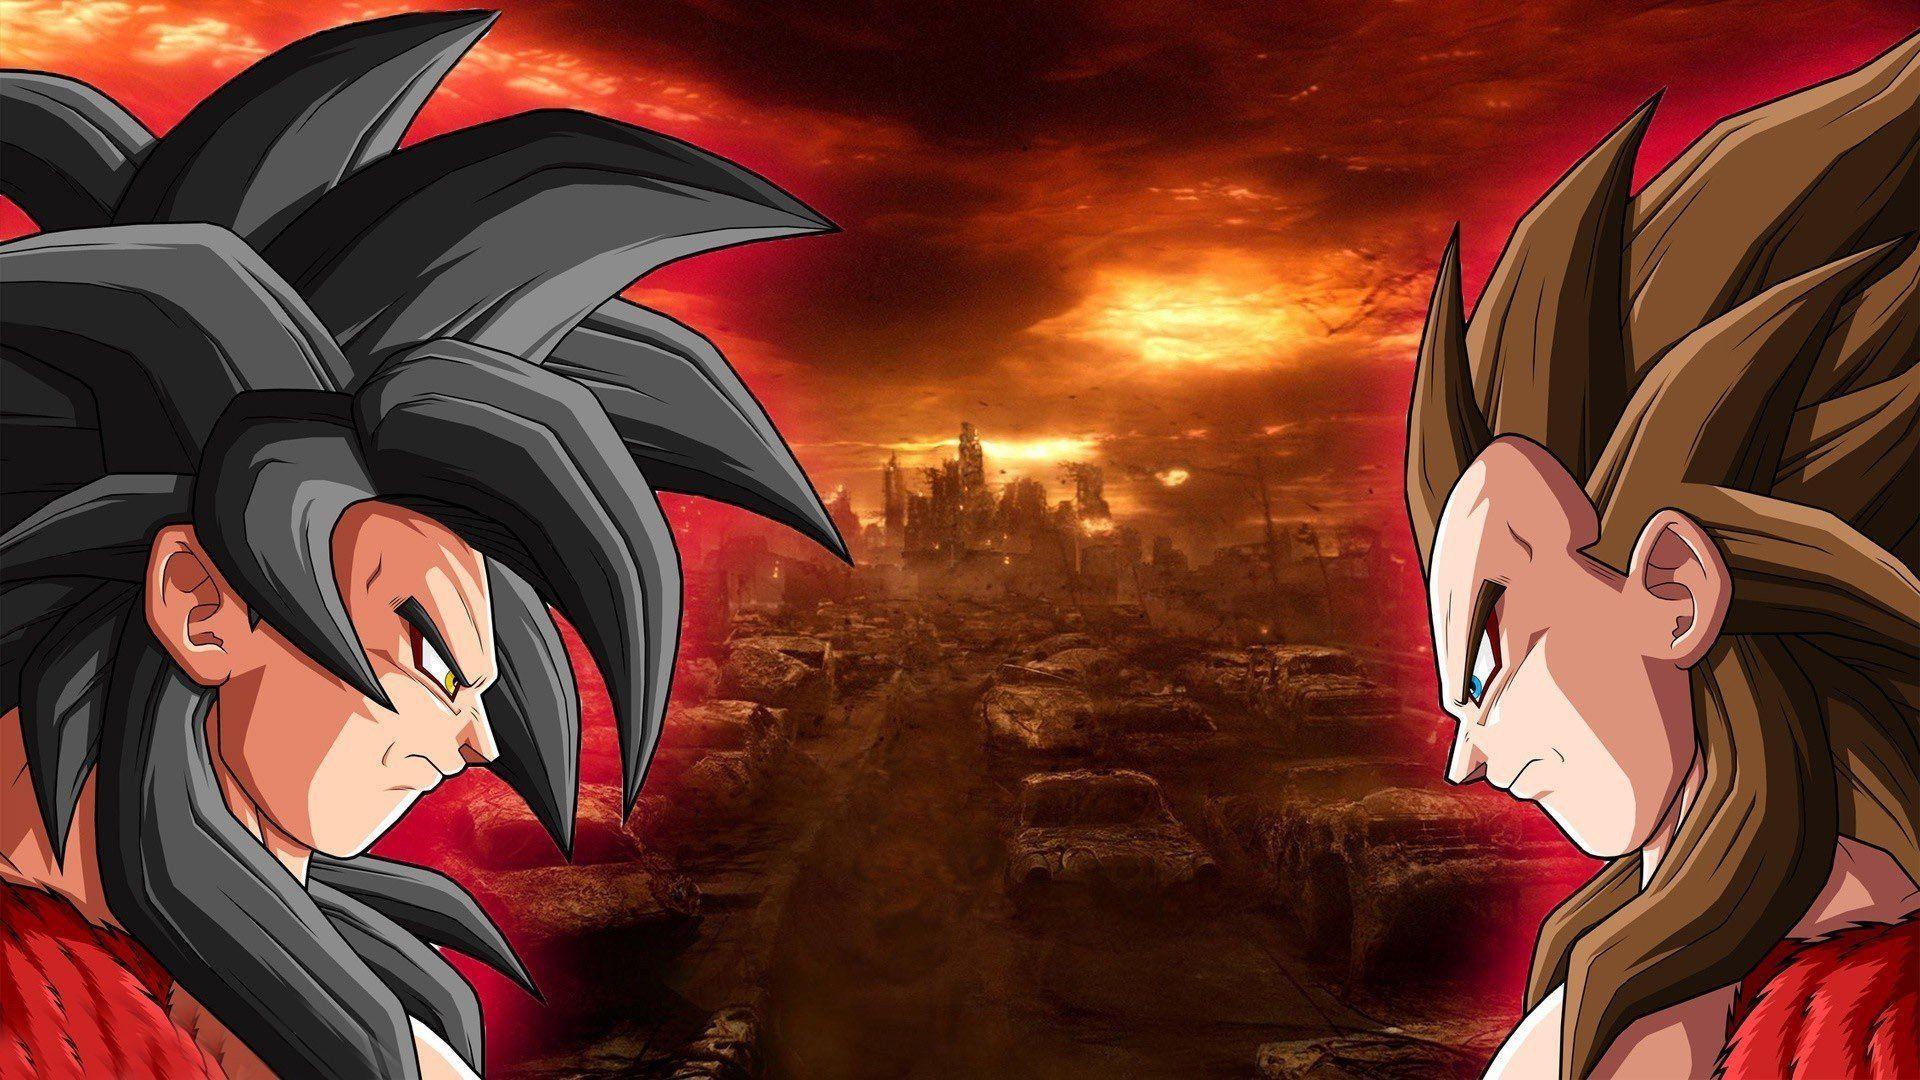 Super Saiyan 4 Goku And Vegeta Wallpapers Wallpaper Cave